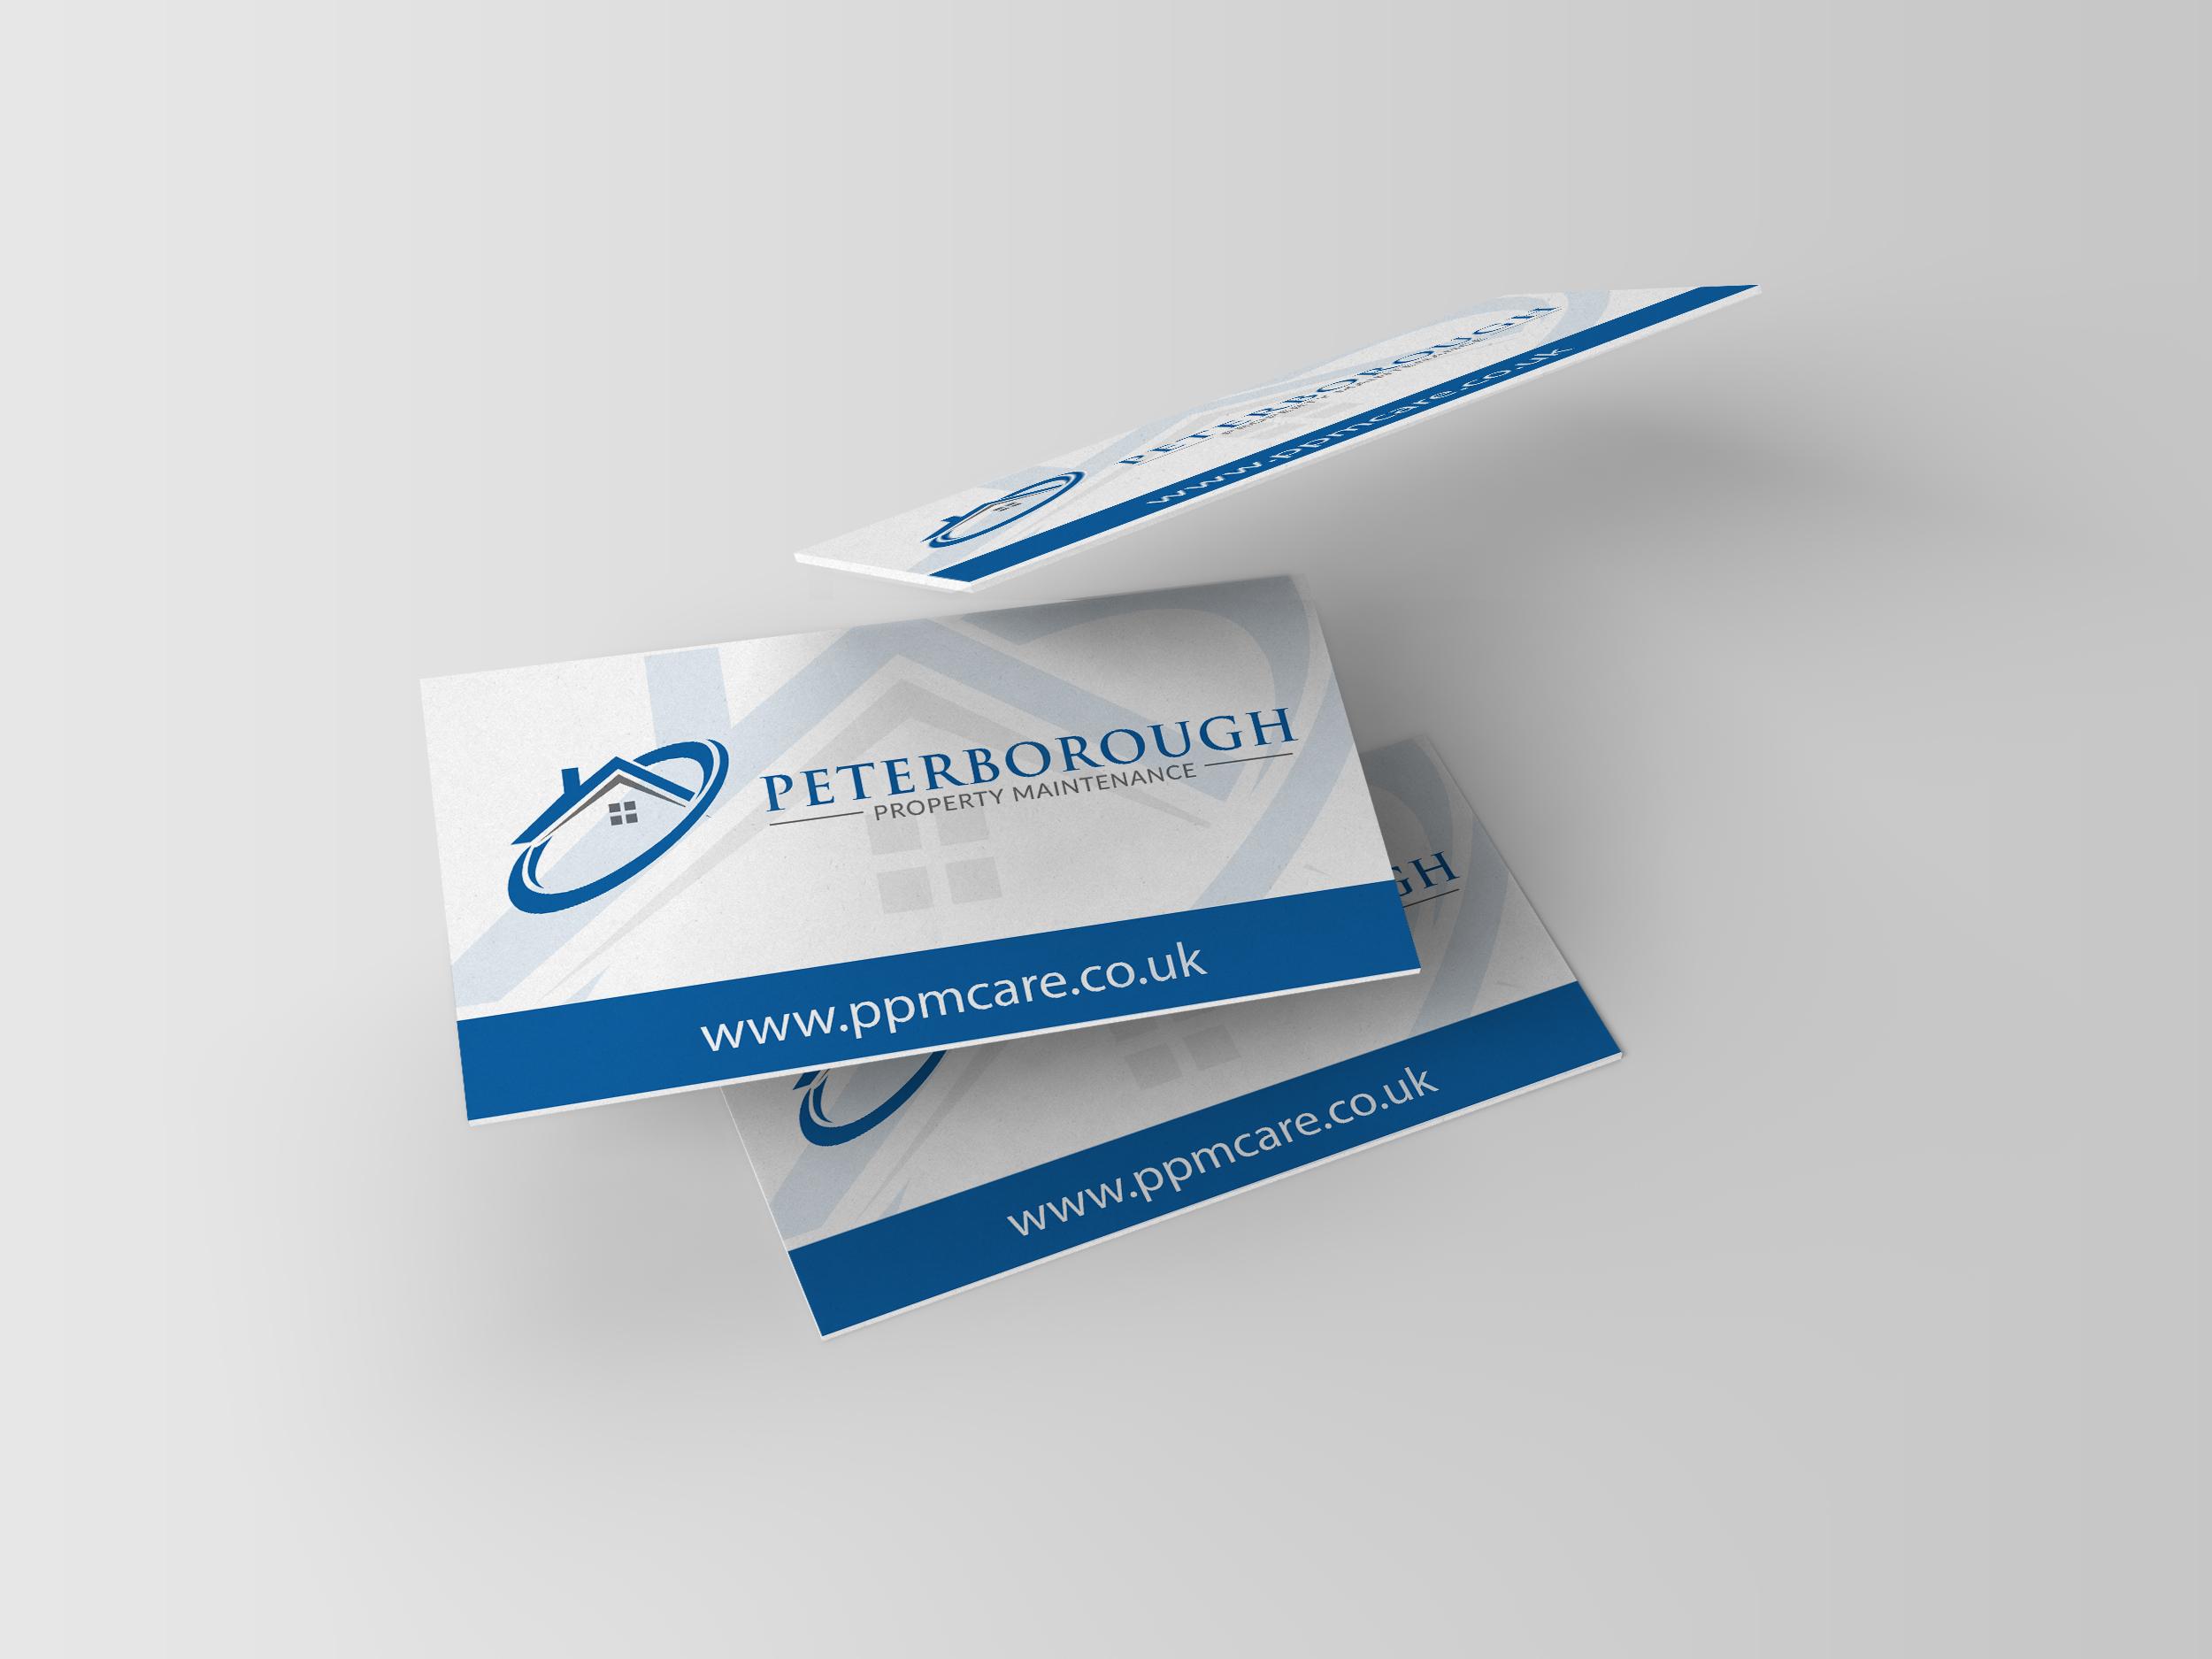 Personalised Stationery   Business Stationery   Promotional Stationery